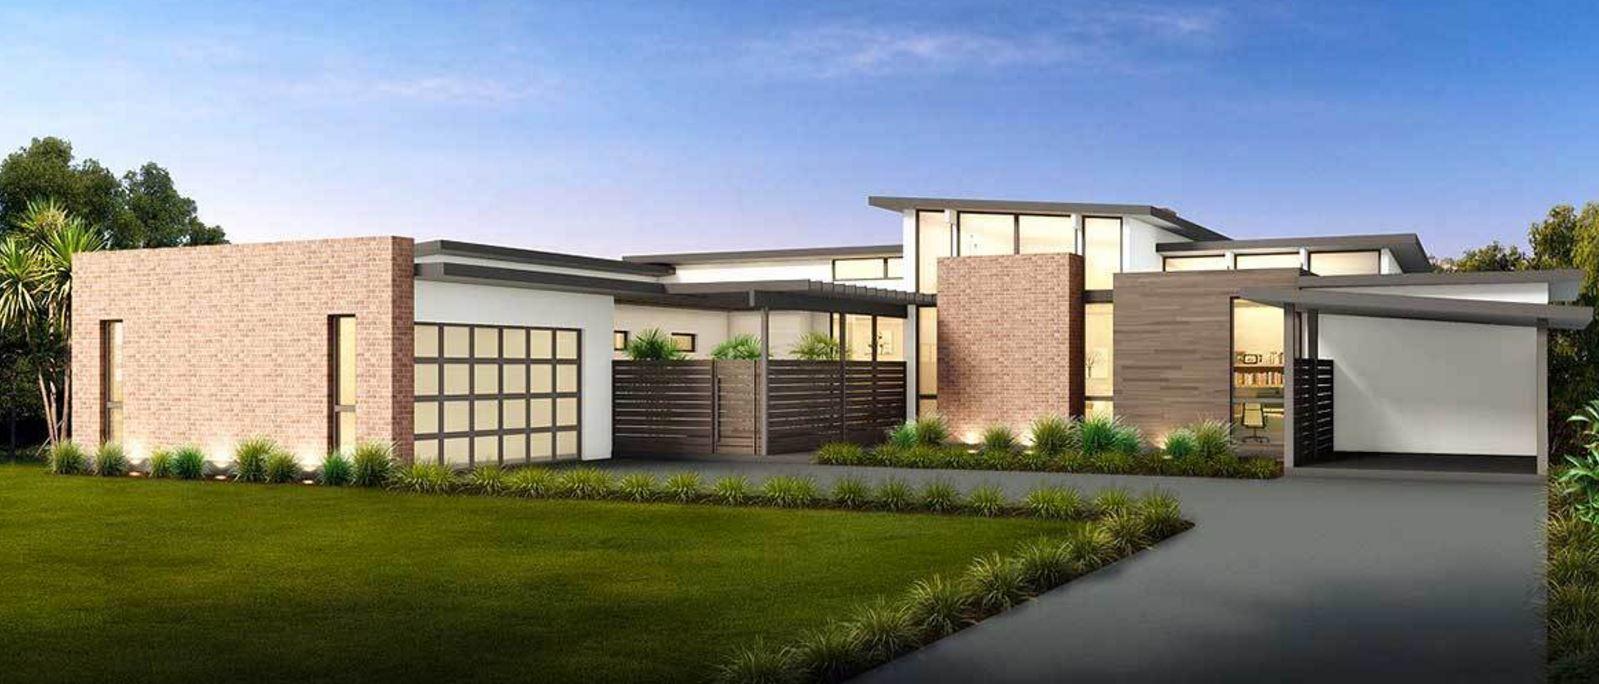 Casas modernas de una sola planta for Plantas de viviendas modernas